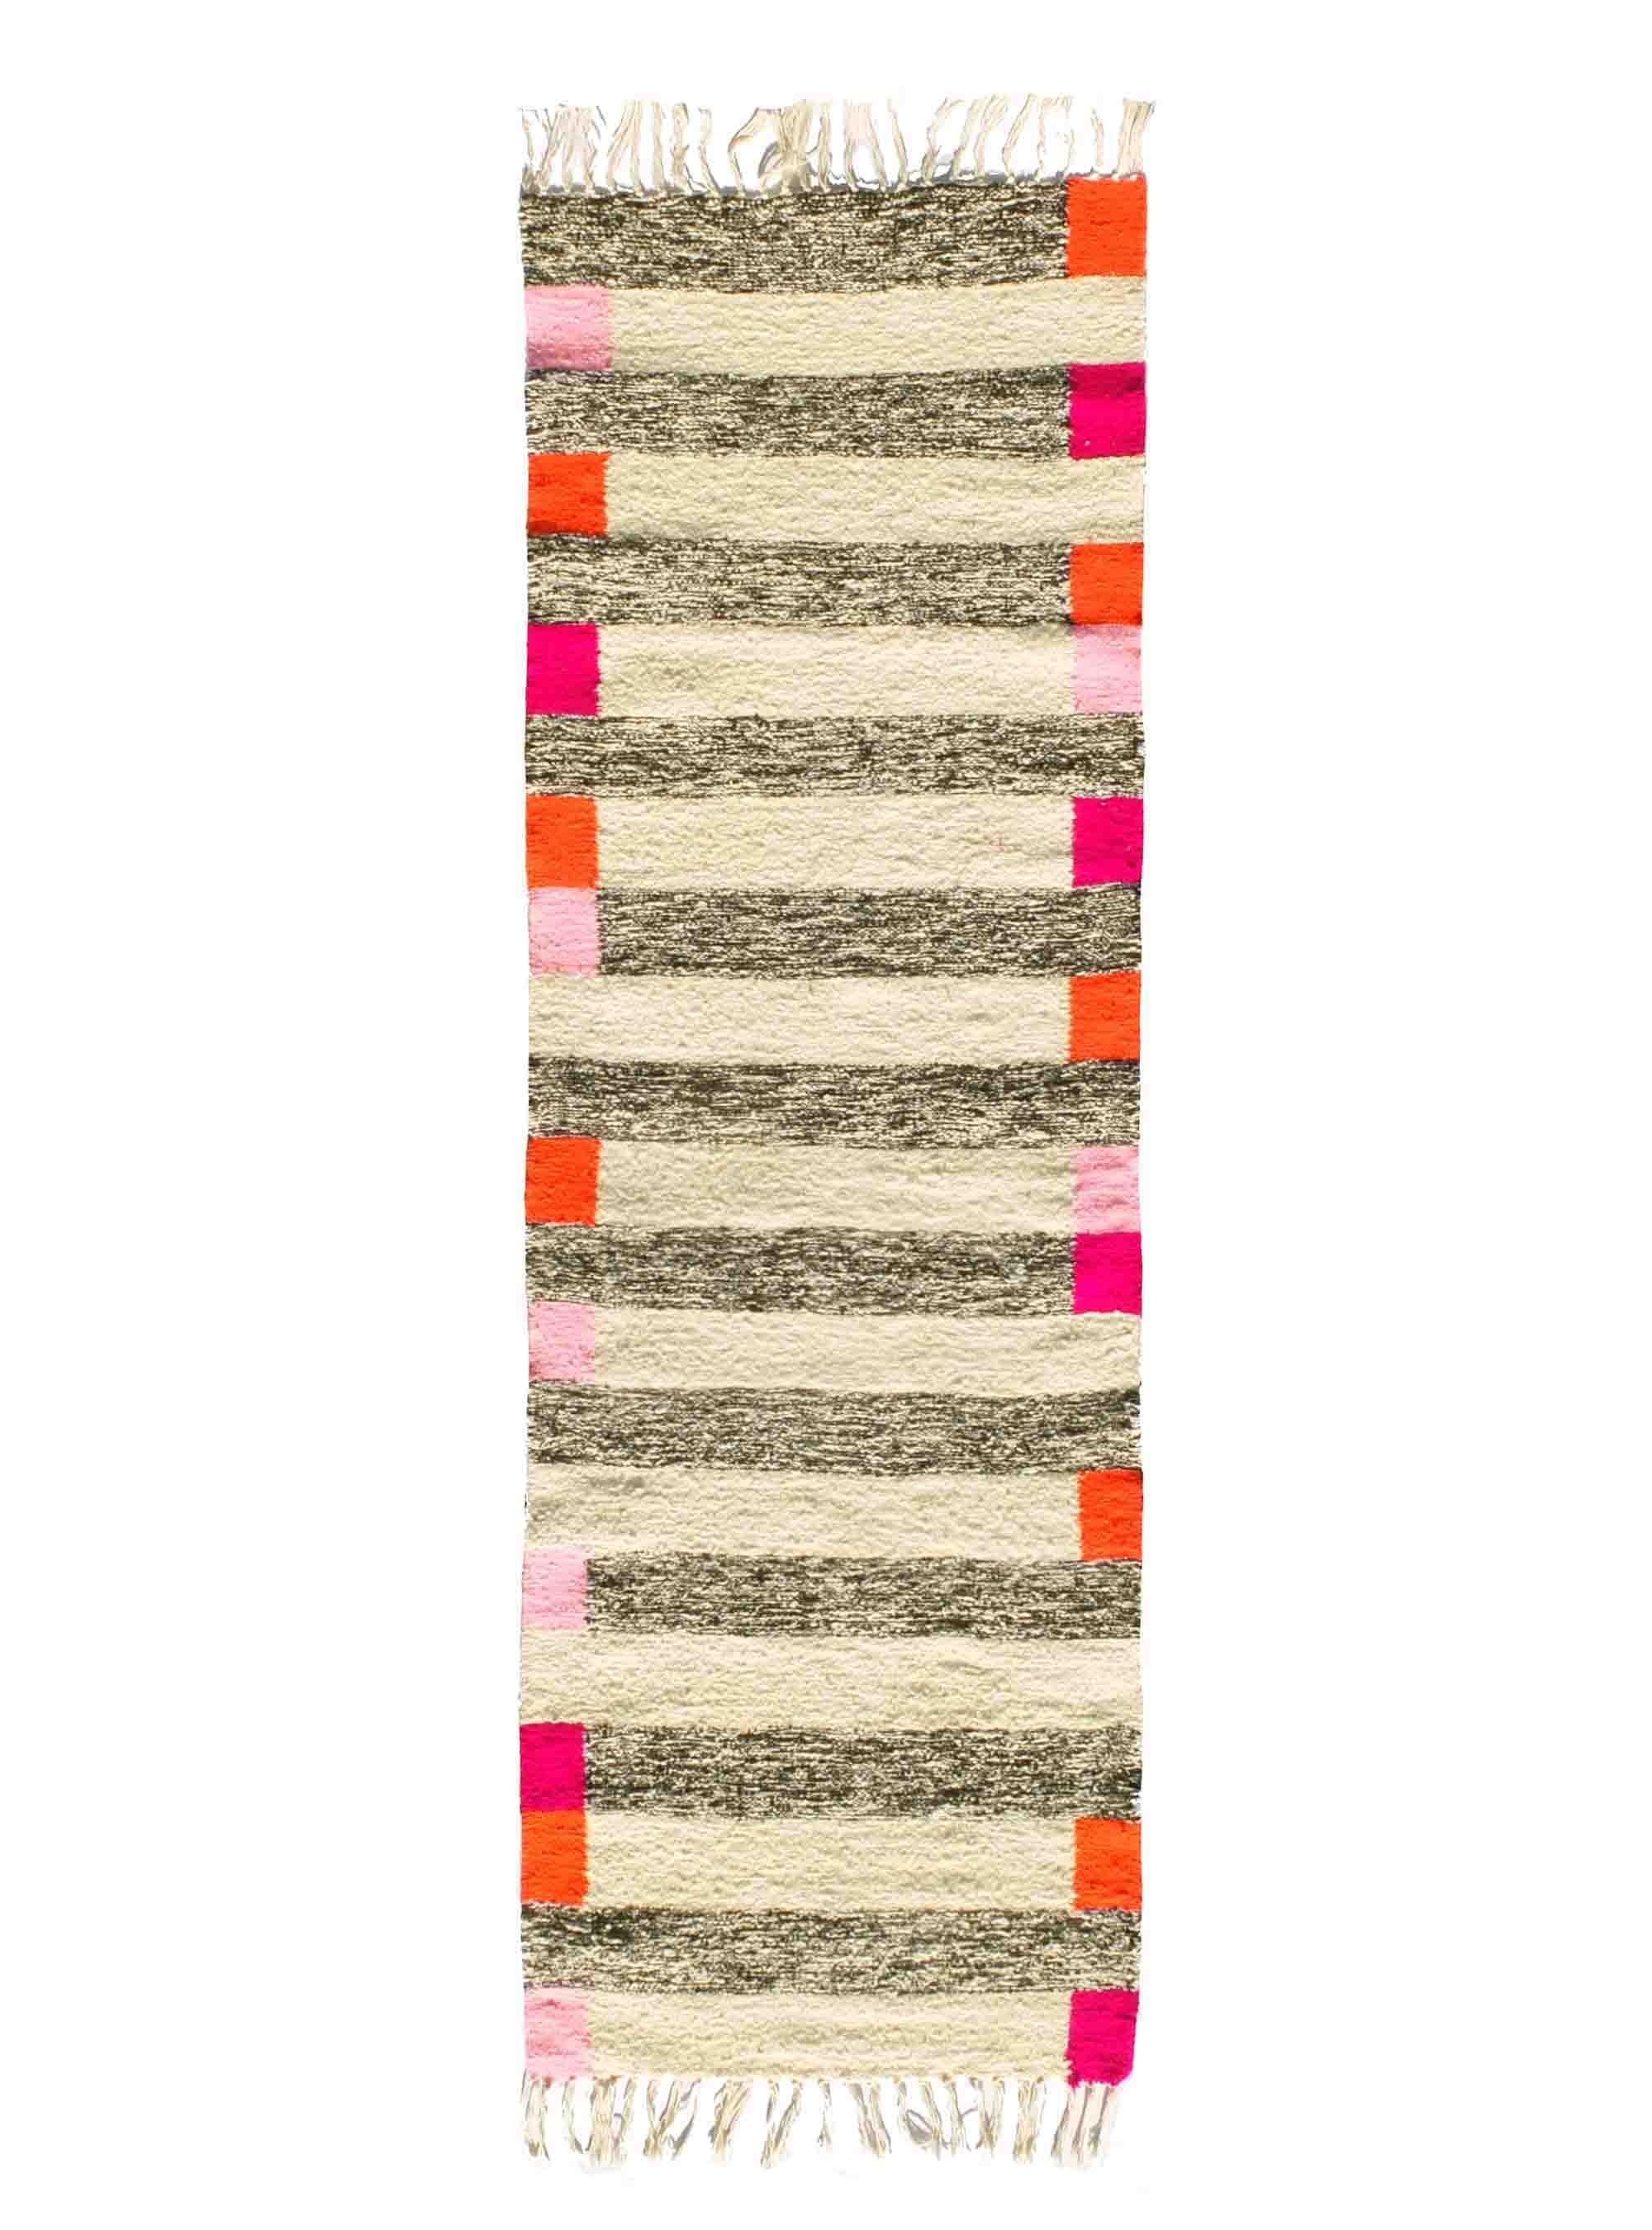 kira-cph handwoven runnerrug. Wool, 70x220 cm. www.kira-cph.com